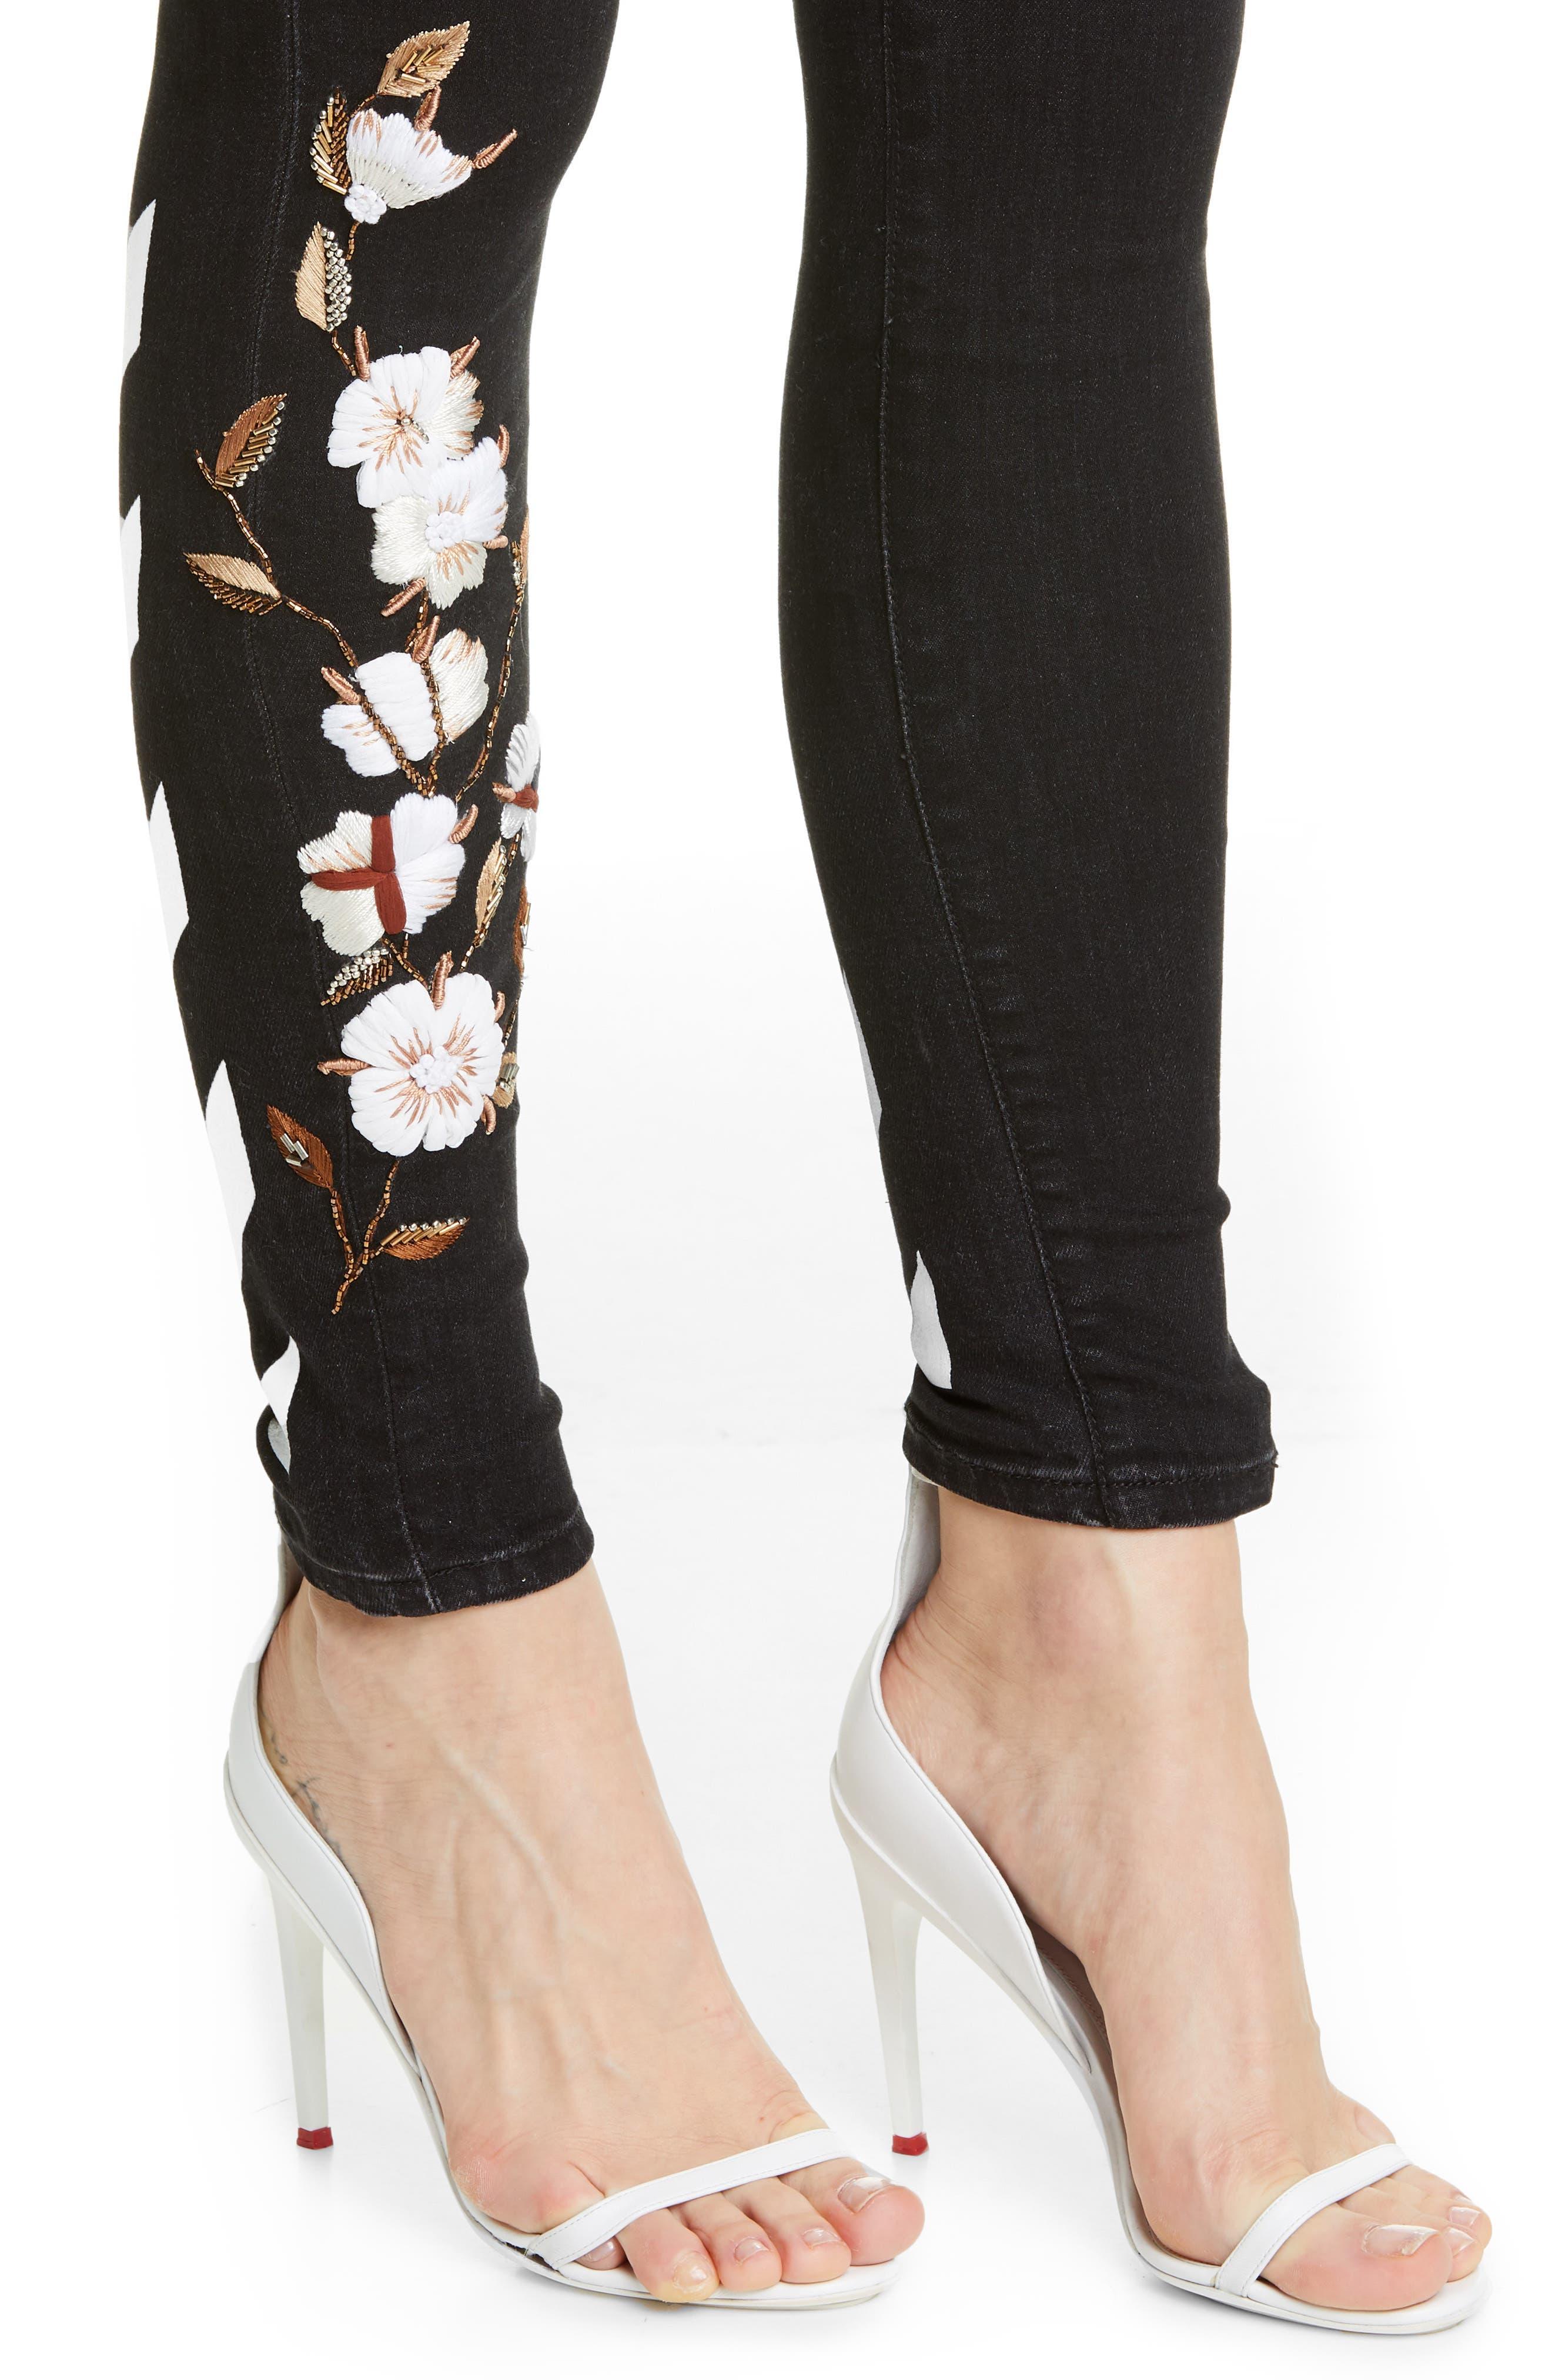 OFF-WHITE, Floral Embroidered Diagonal Stripe Skinny Jeans, Alternate thumbnail 4, color, VINTAGE BLACK